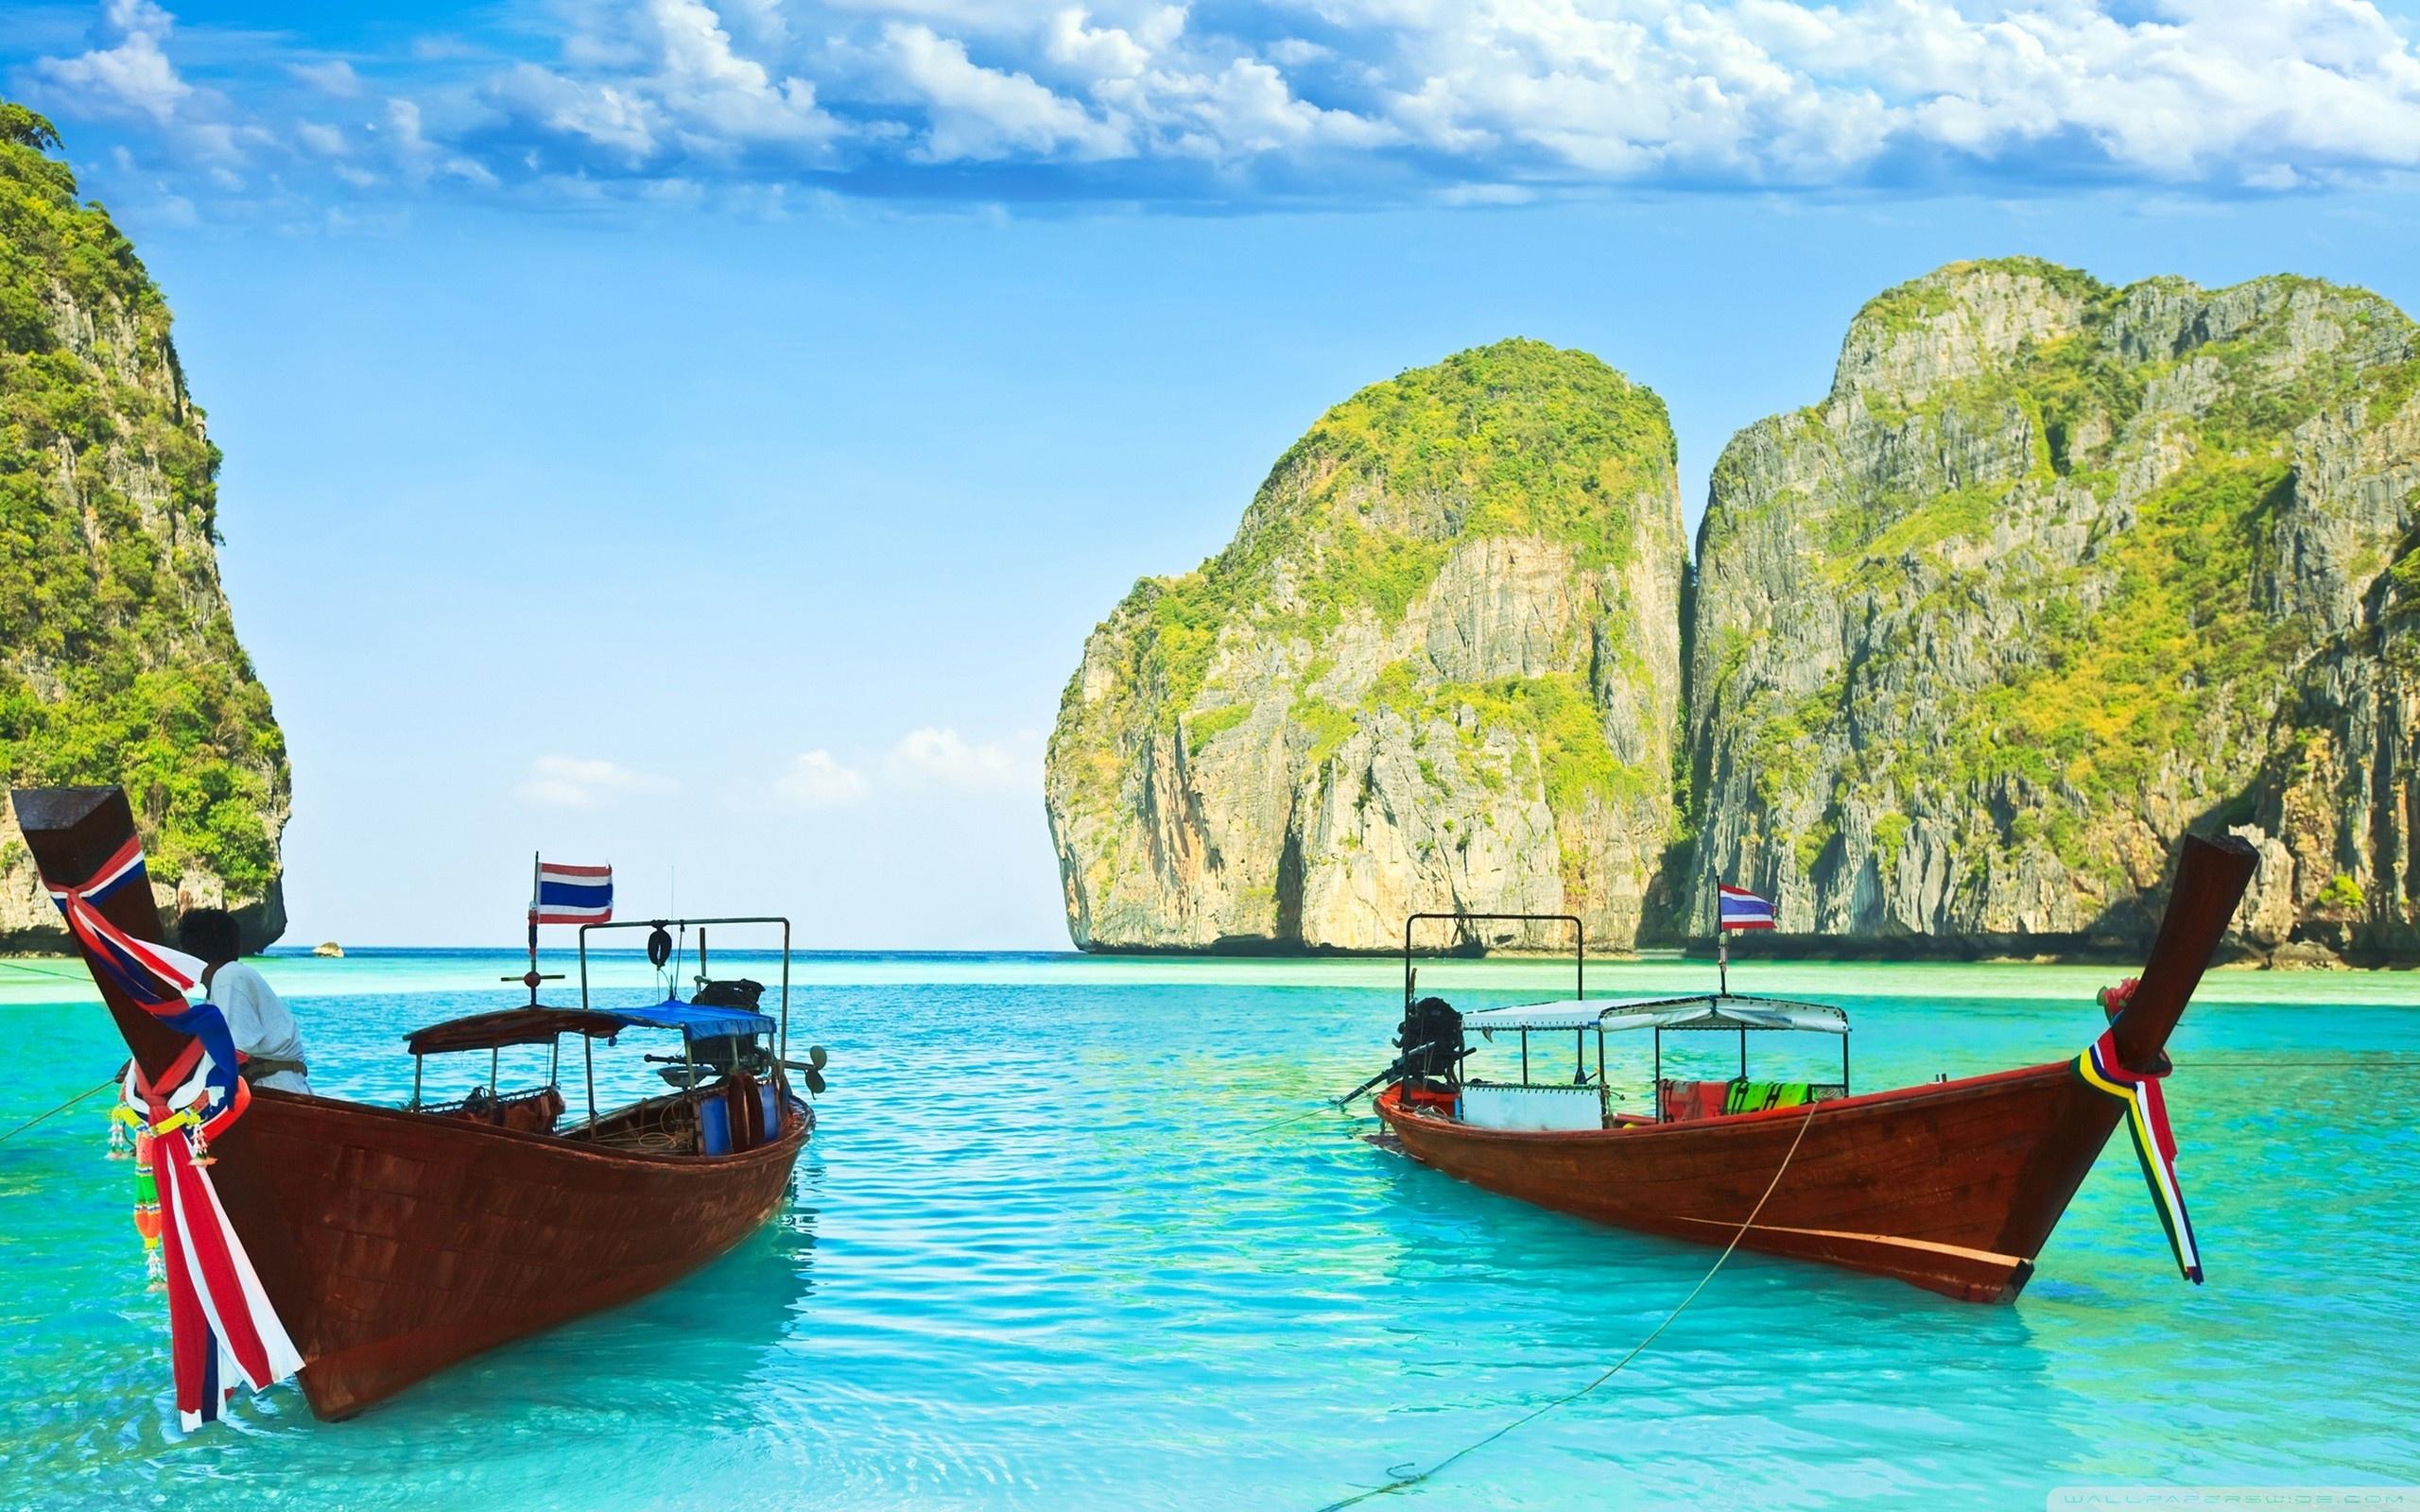 Maya Bay, Thailand HD desktop wallpaper : High Definition